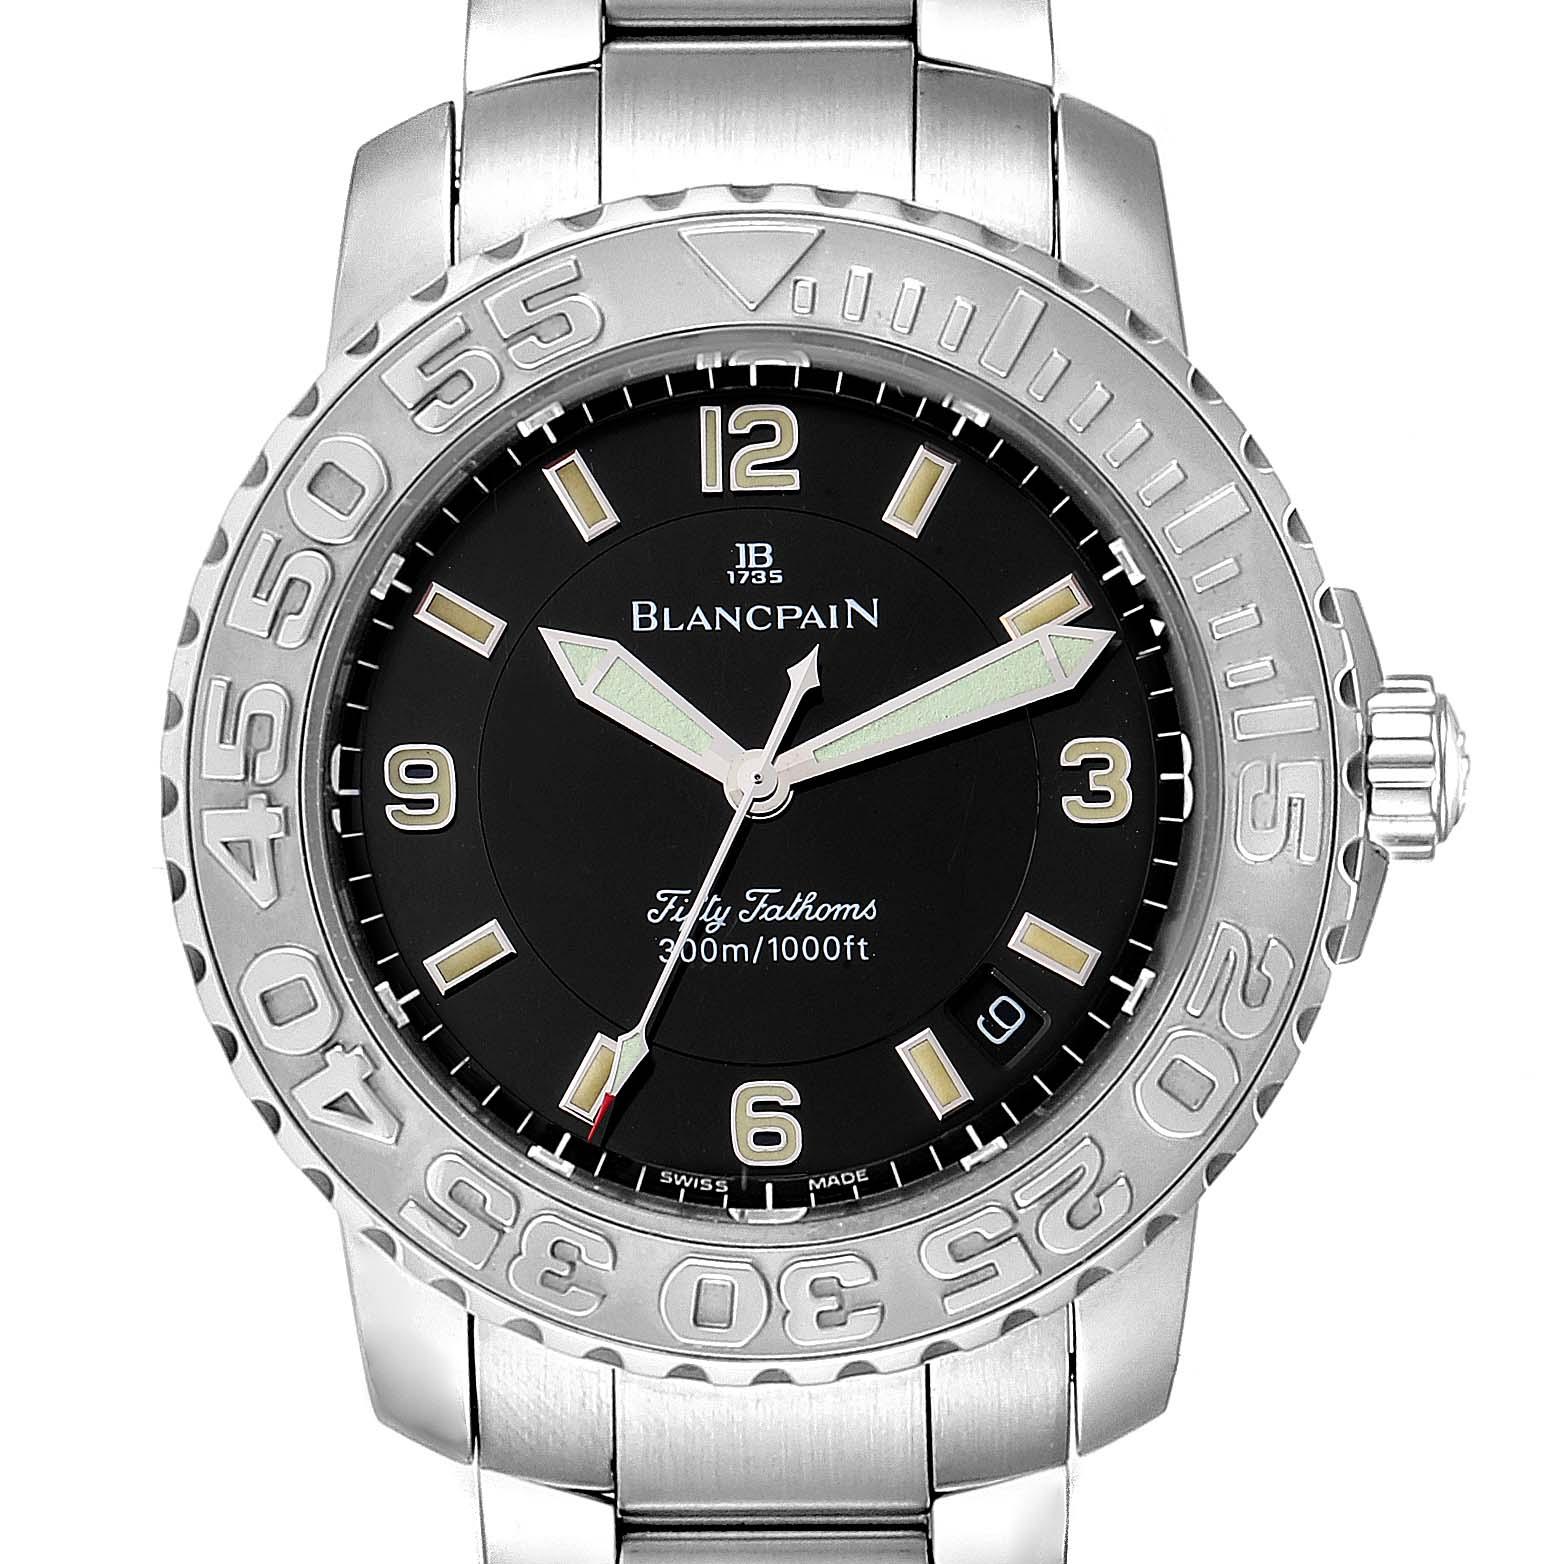 Blancpain Fifty Fathoms Specialties Divers Steel Mens Watch 2200 SwissWatchExpo